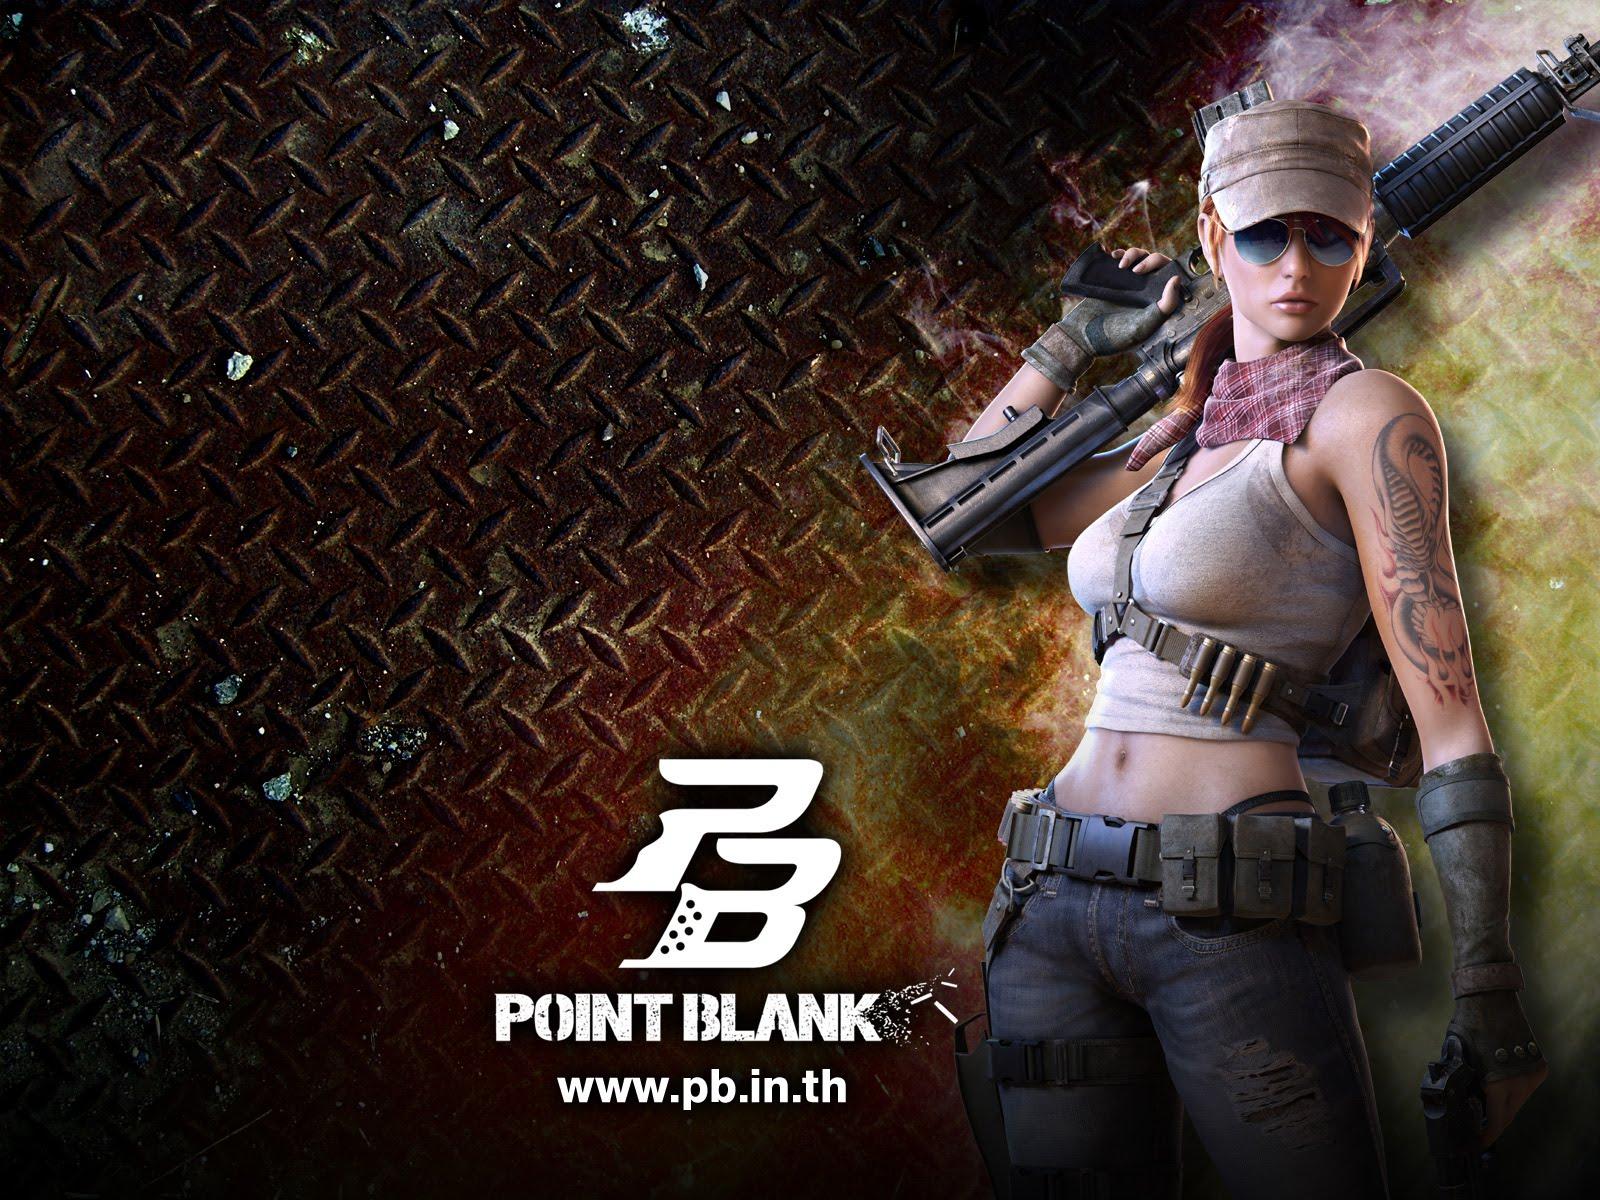 PB Point Blank Wallpaper Creative Poster HD Zeromin0